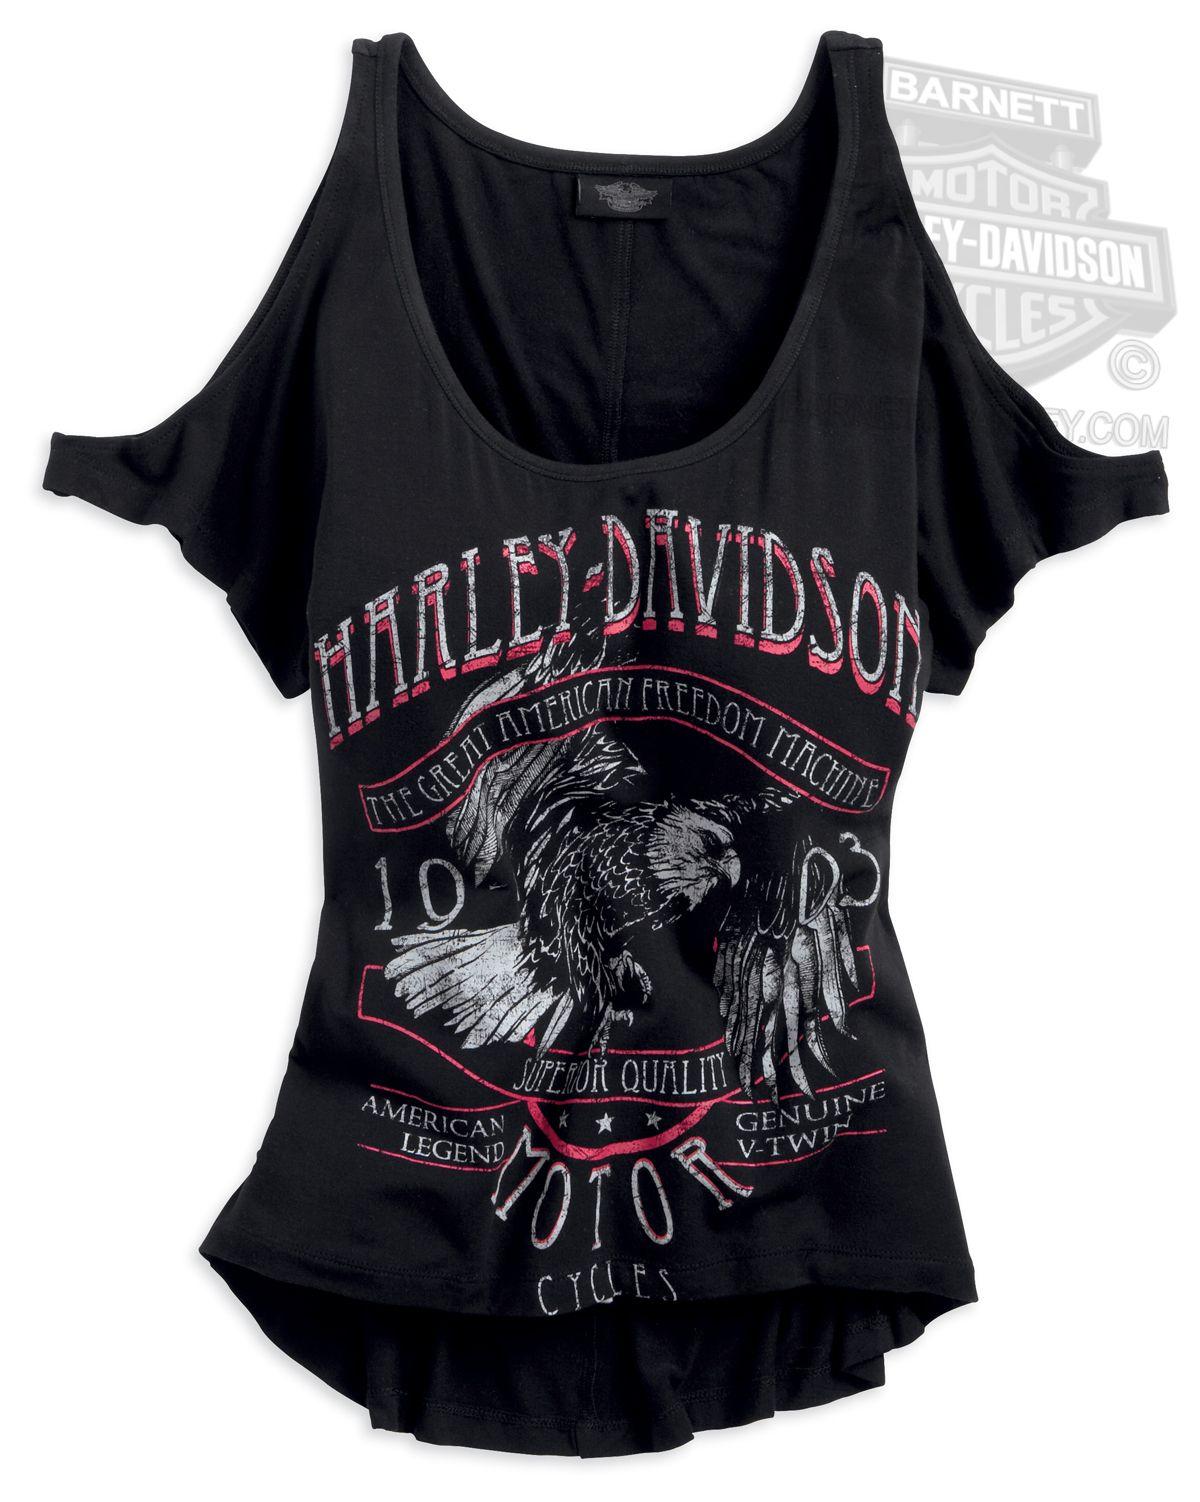 Harley davidson clothing for women